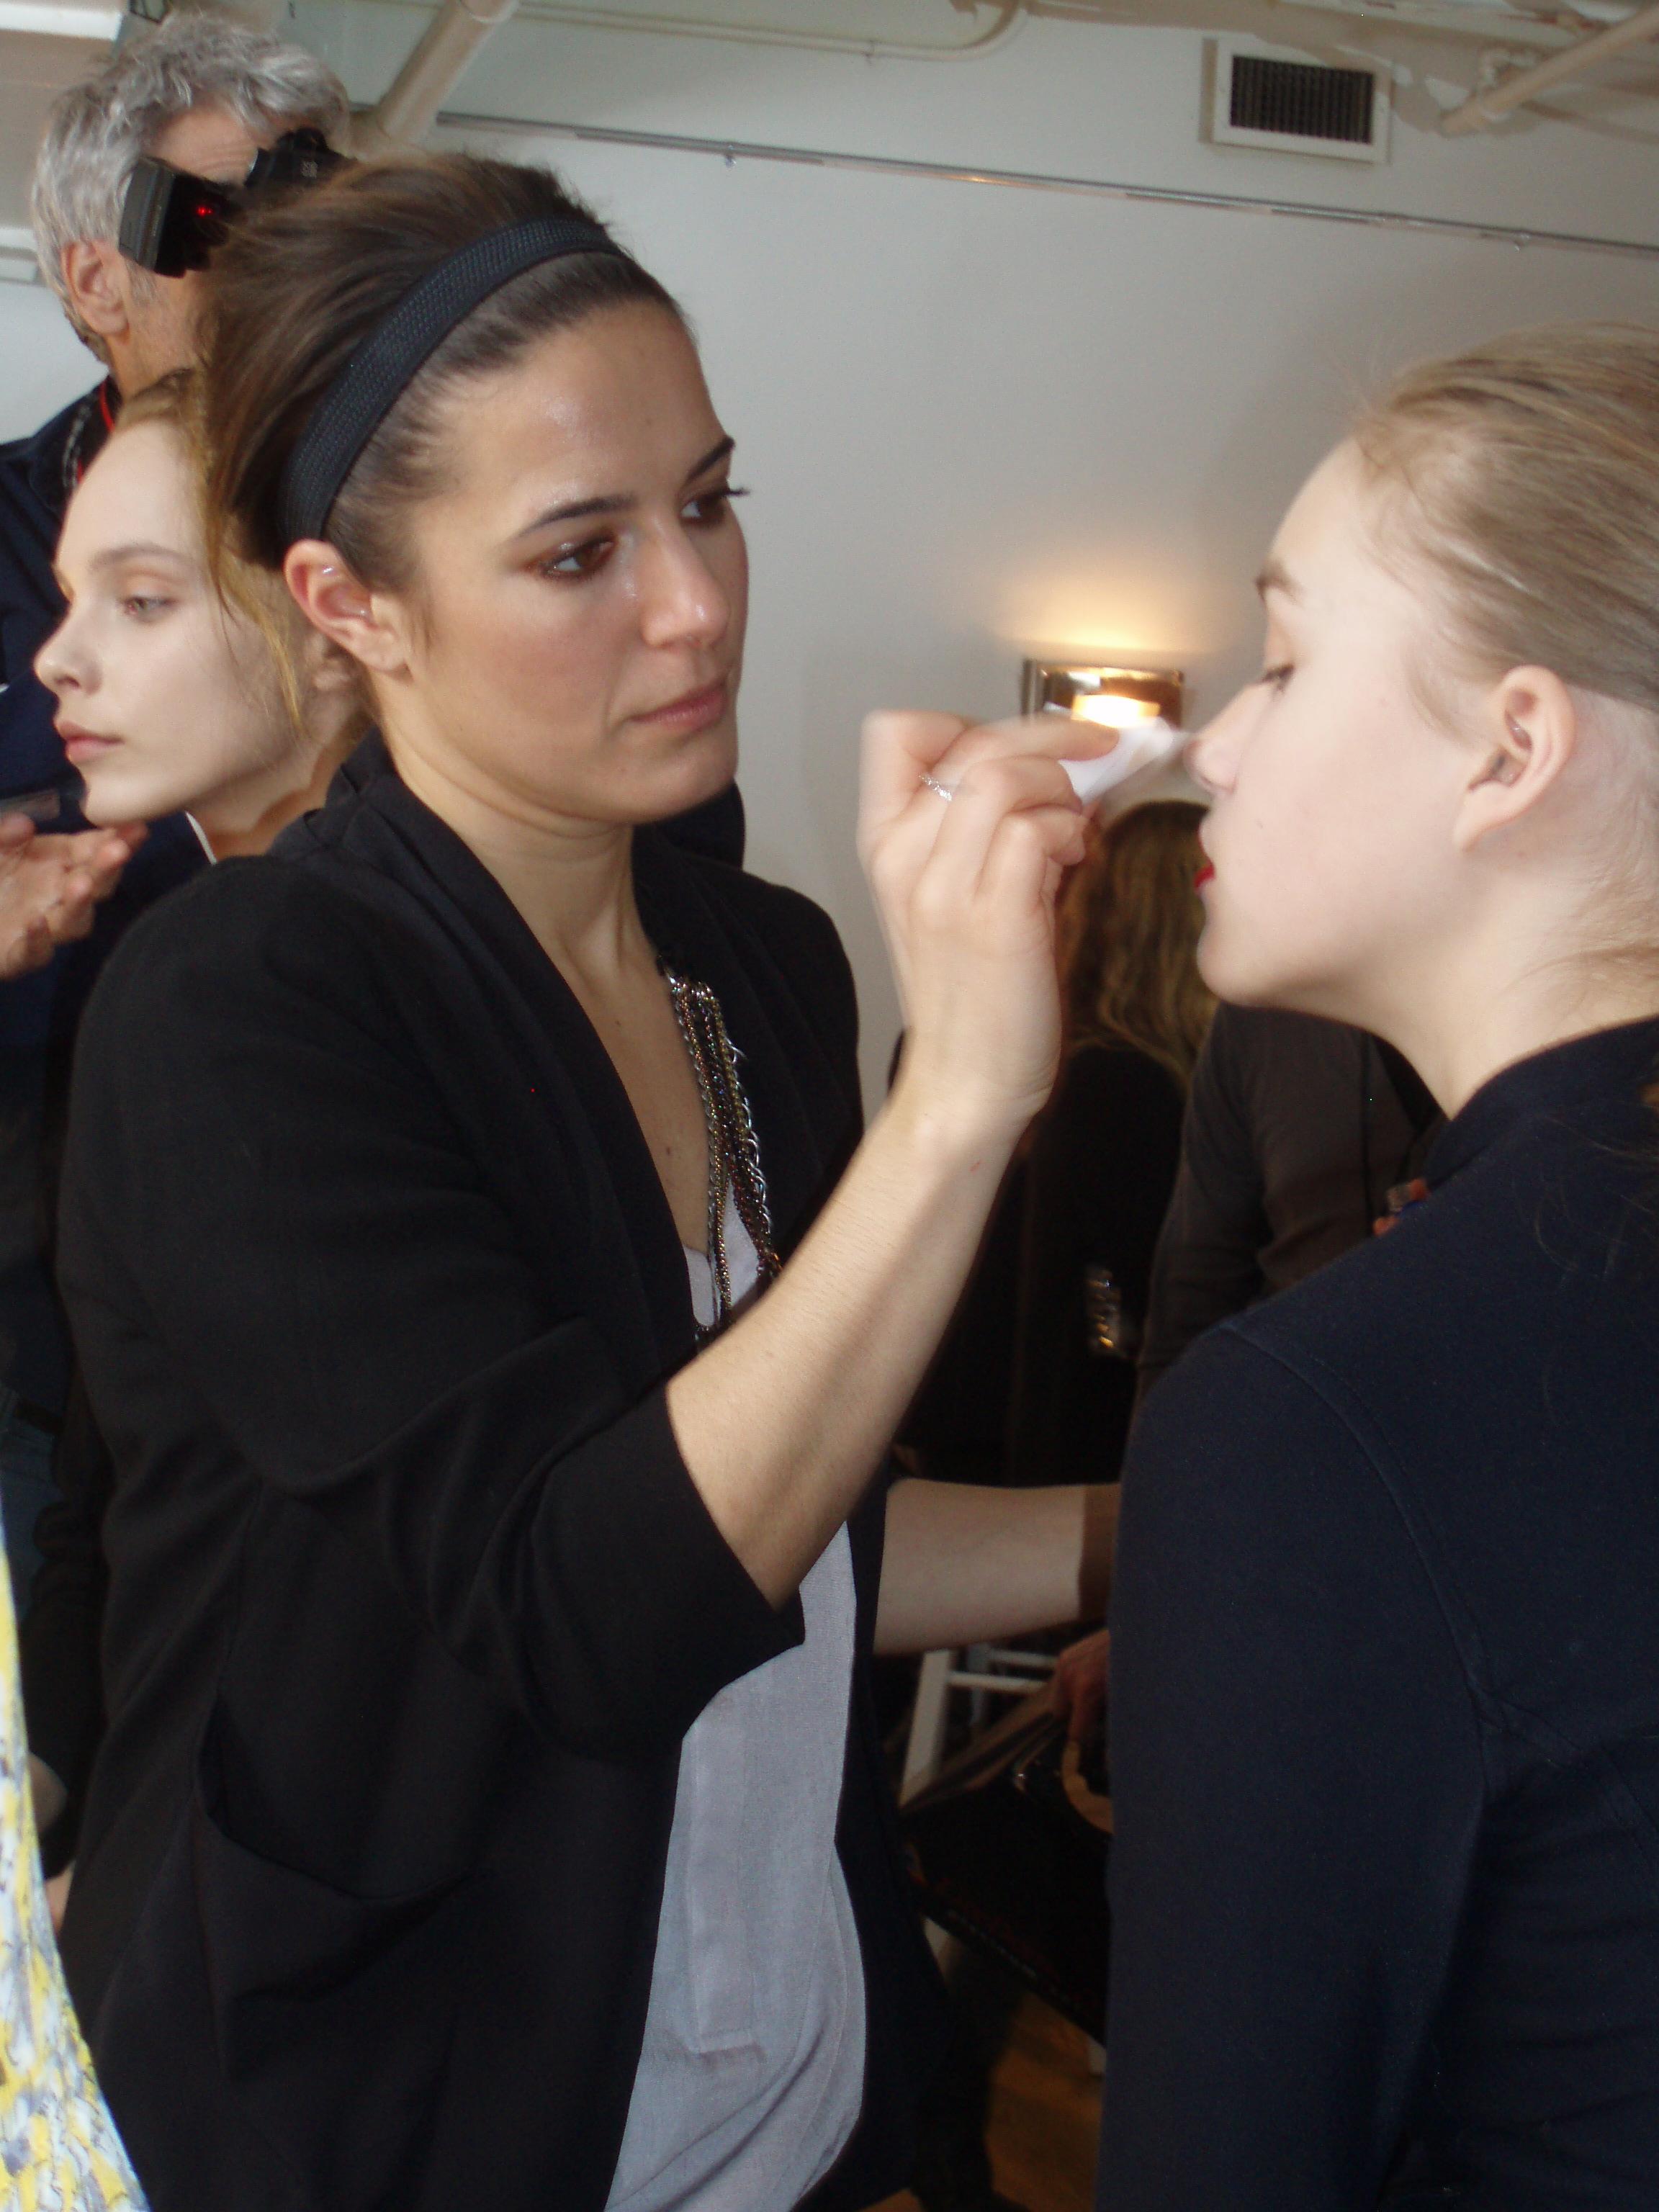 Jenna Menard for Shiseido applies minimal makeup and bright lips.